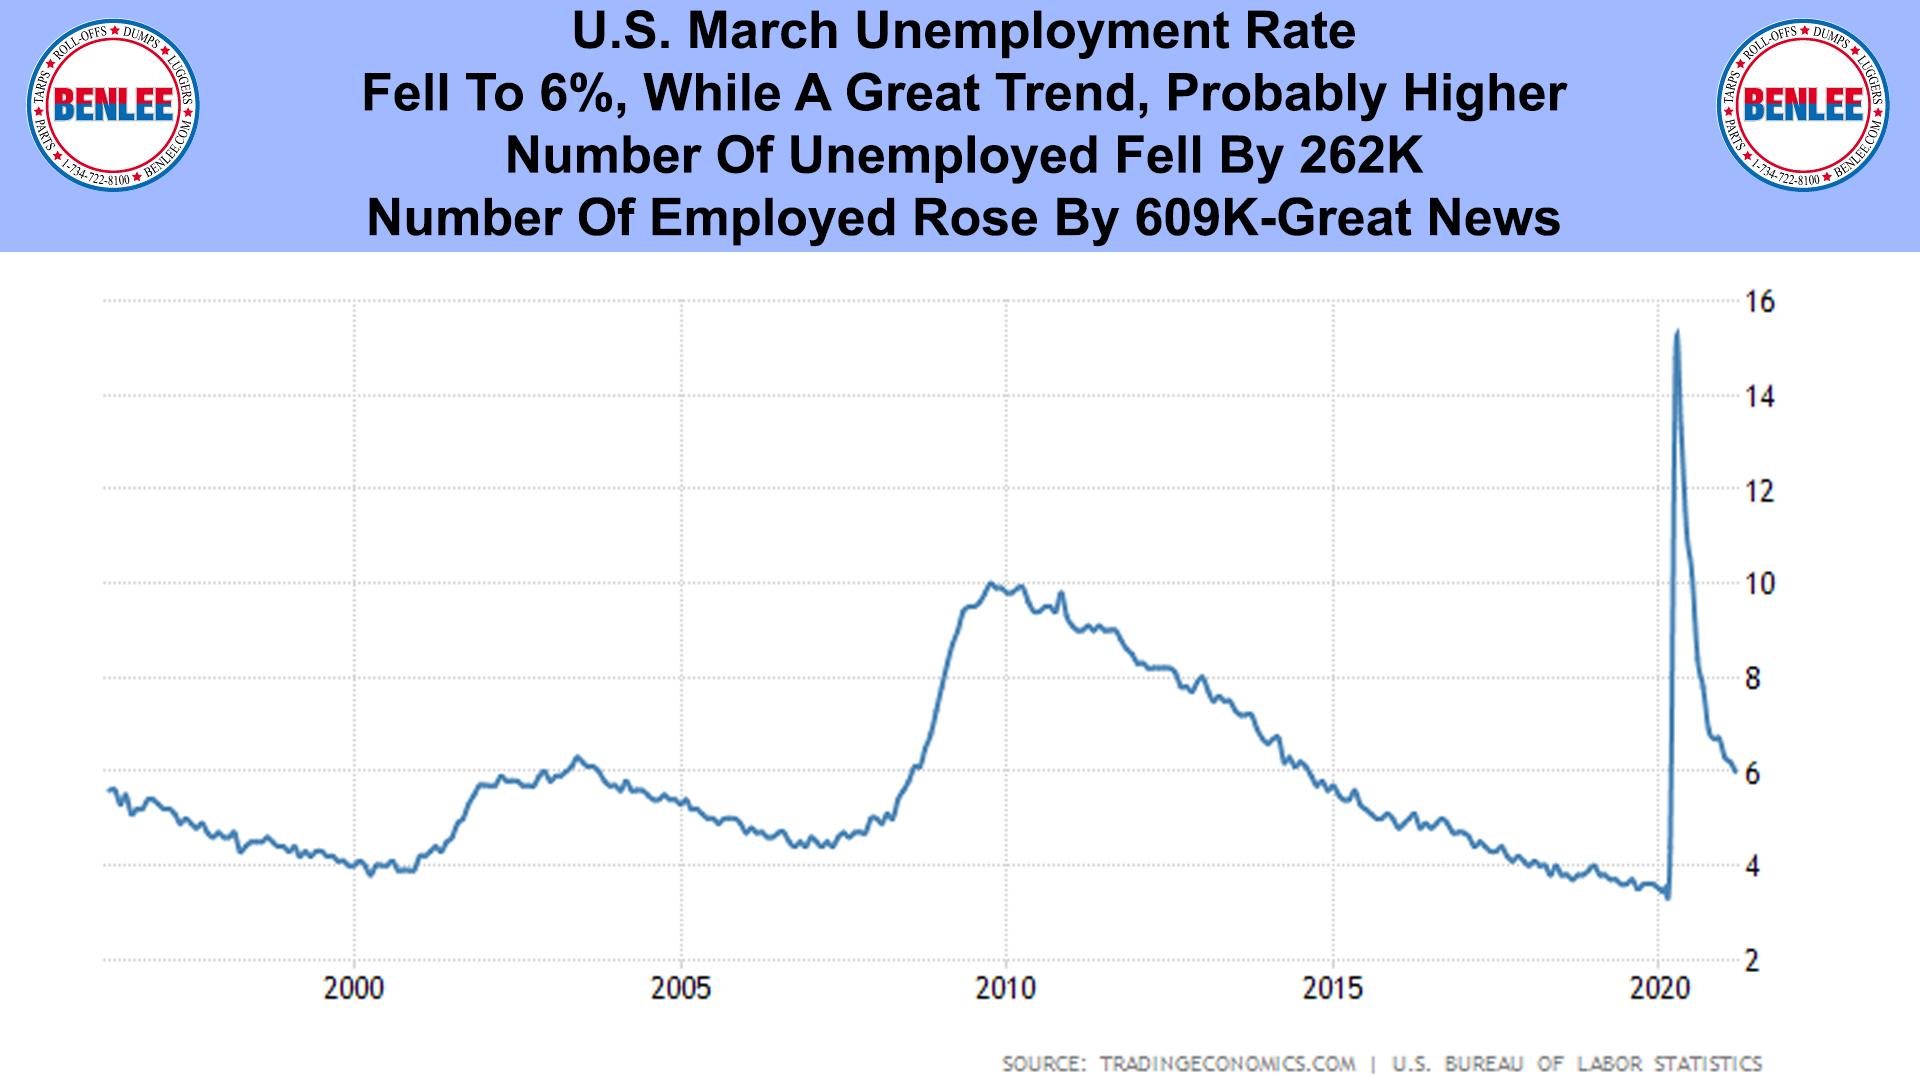 U.S. March Unemployment Rate